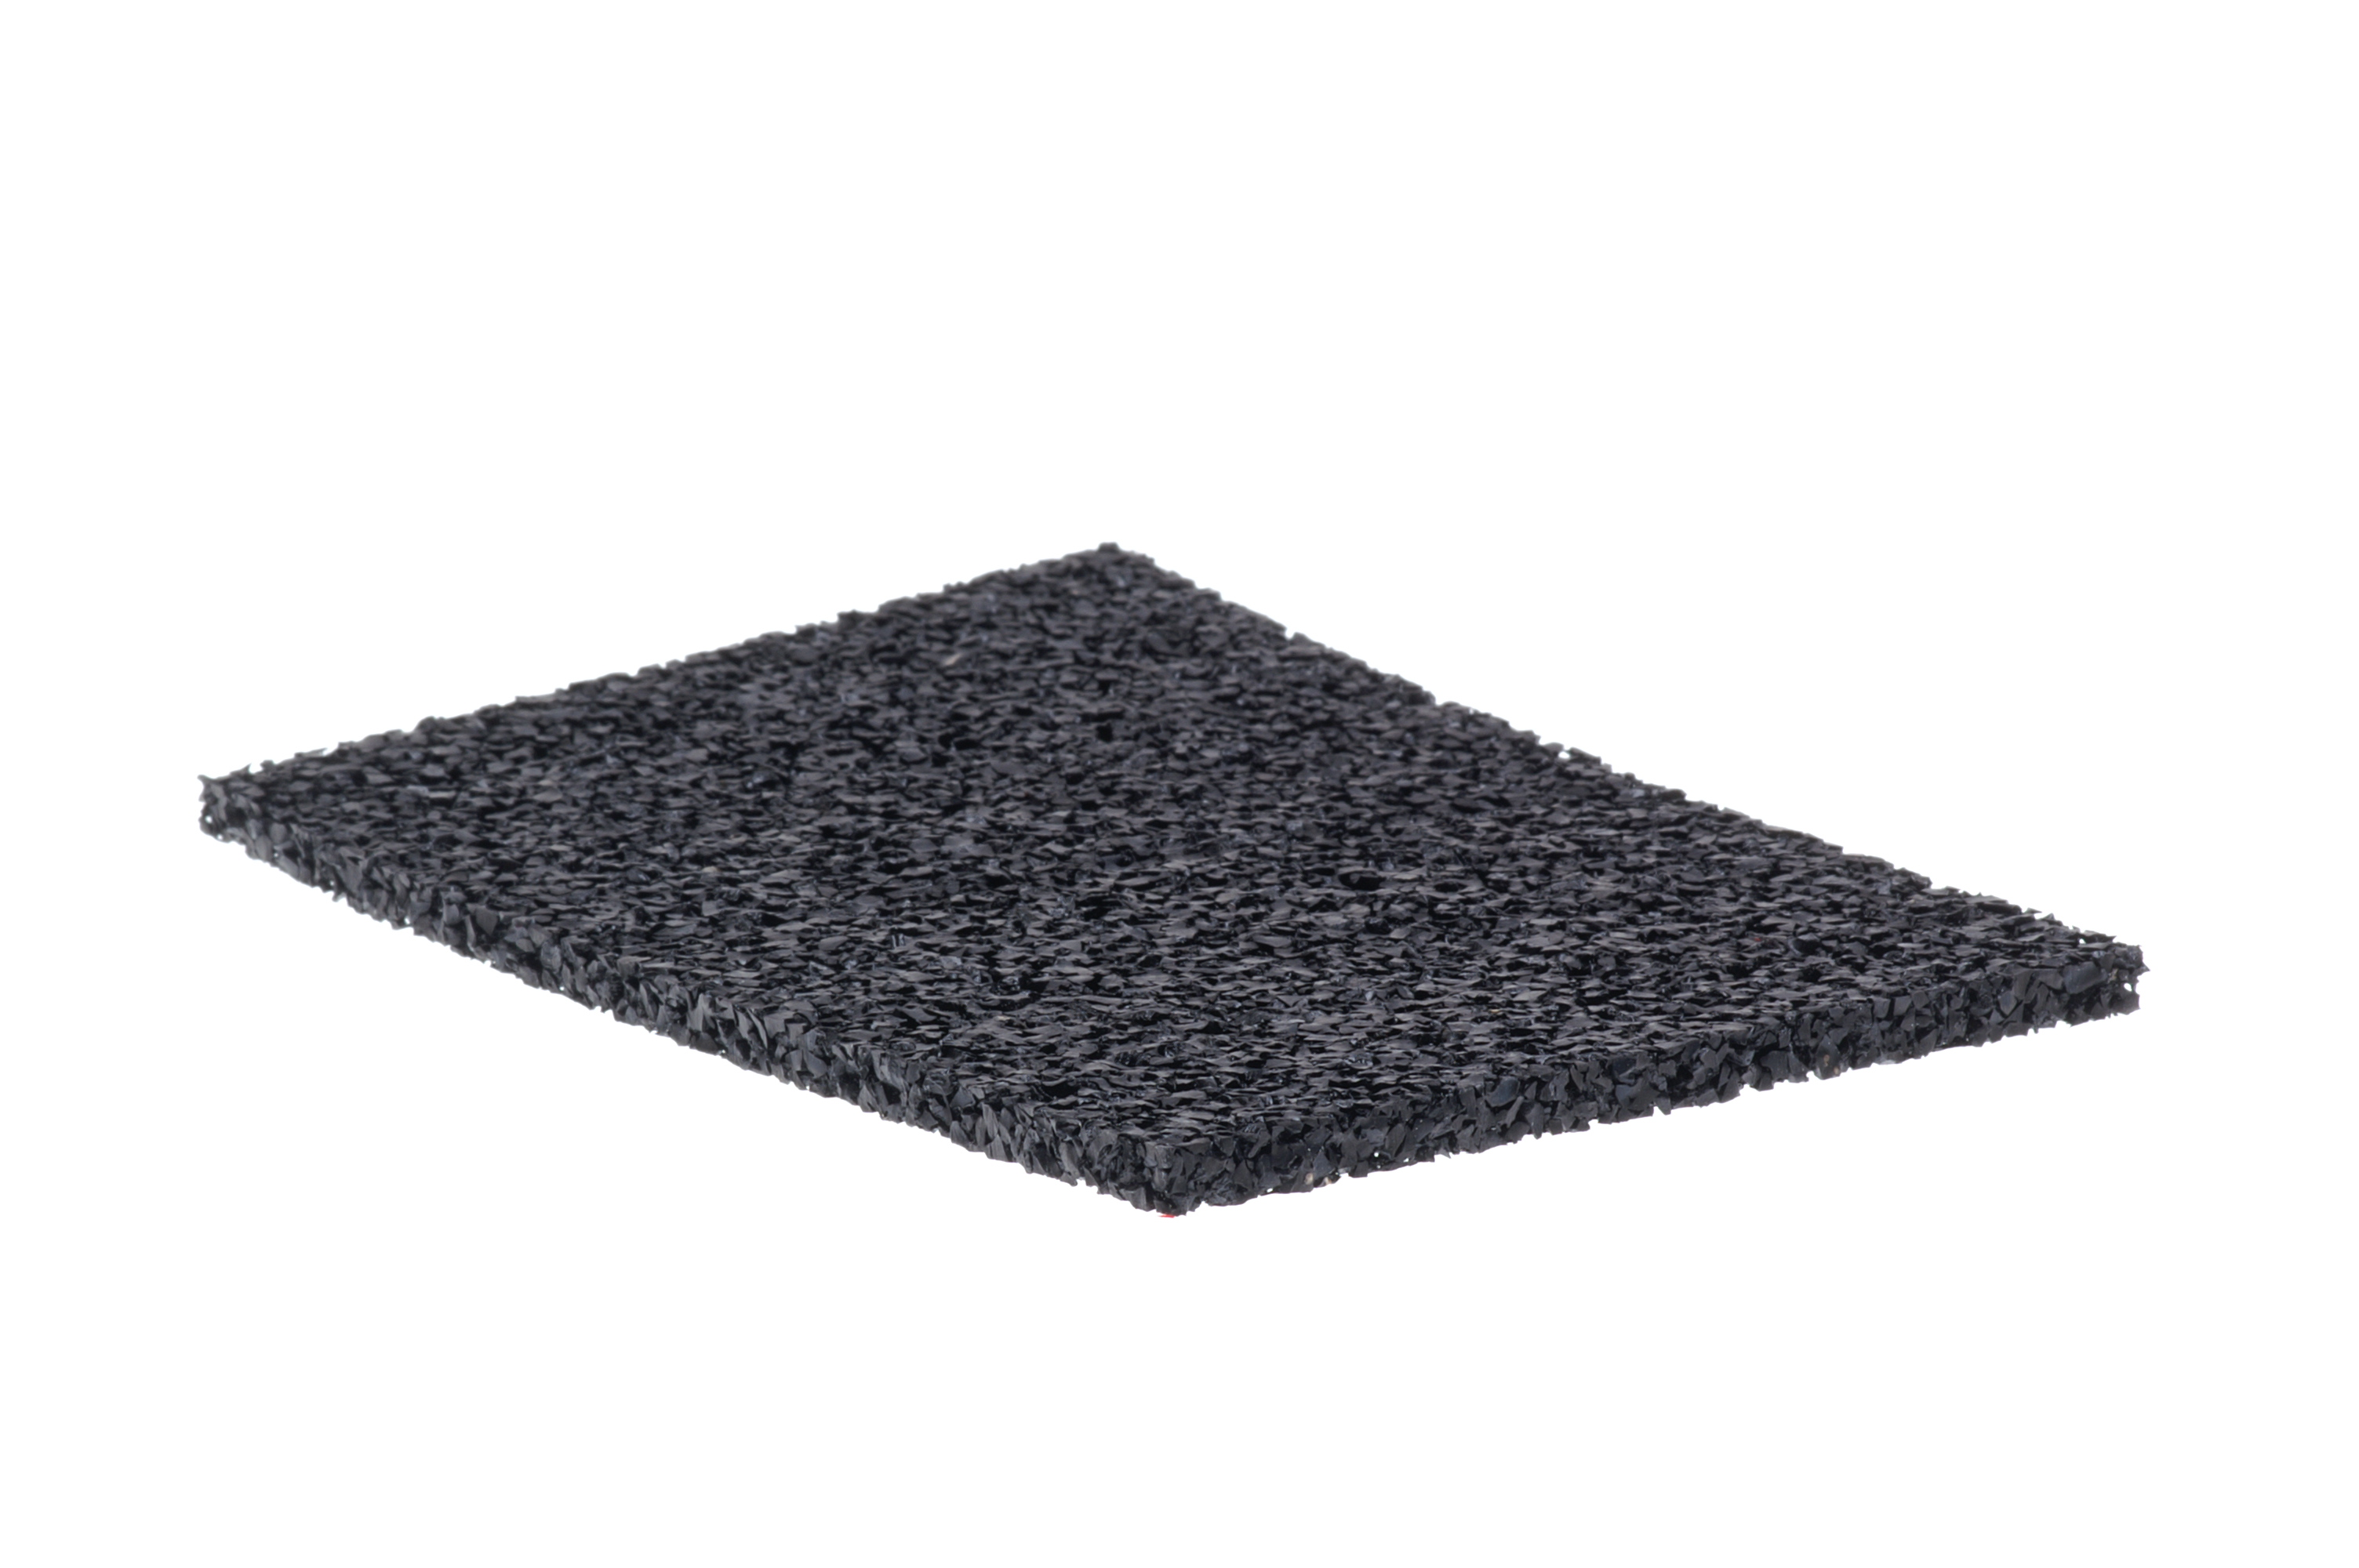 Granulaat Rubber Rol.Granulaatrubber Op Rol Ondervloer Budget